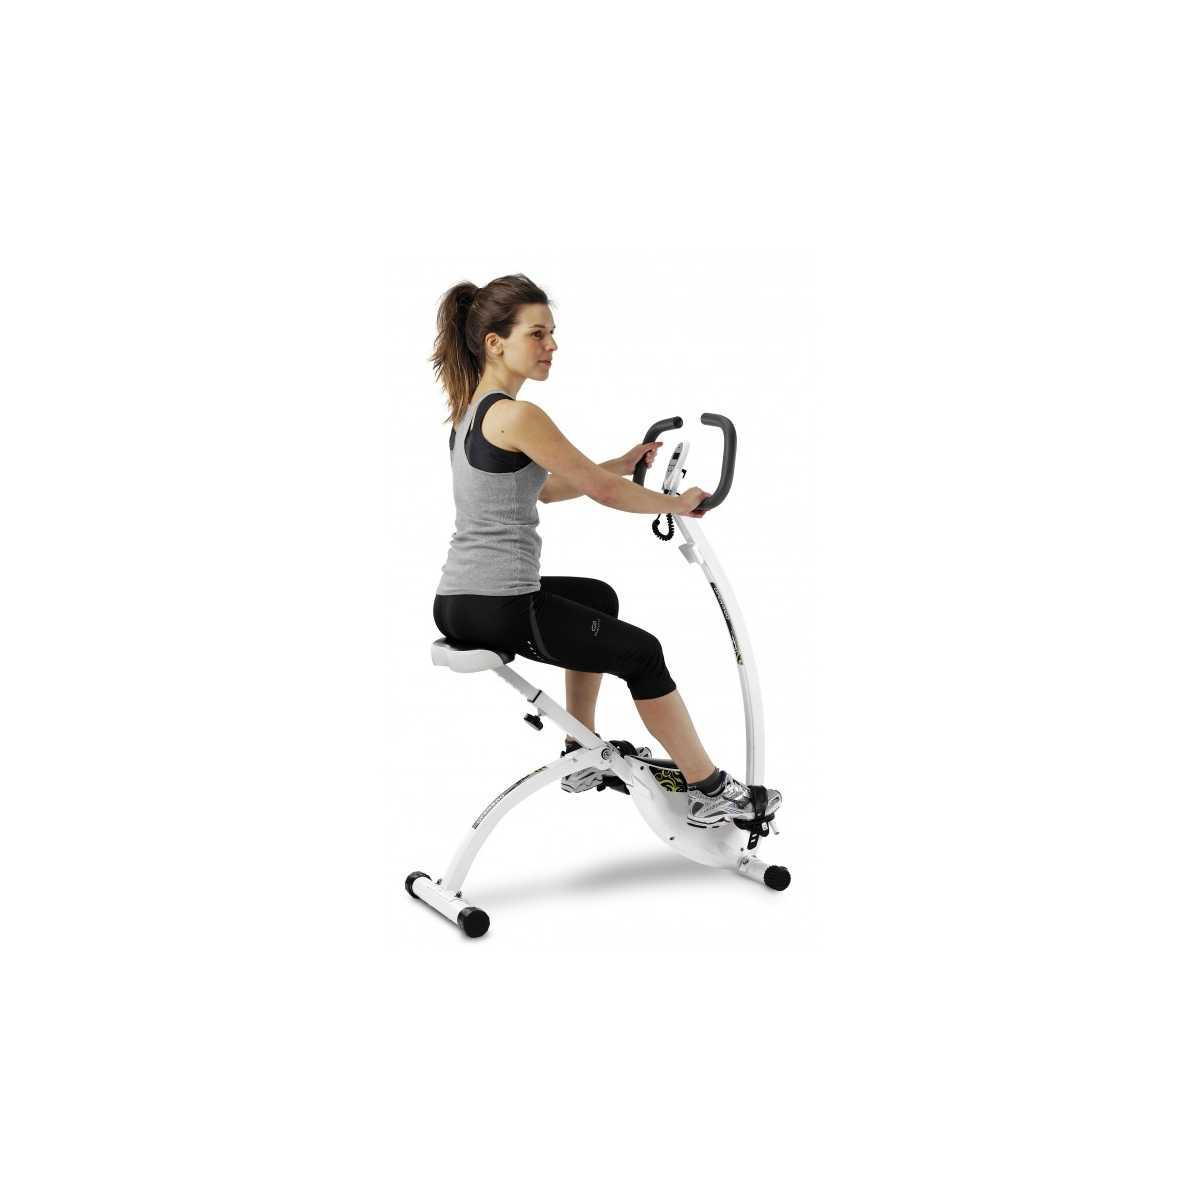 Bicicleta estática dobrável motorizada PowerBike